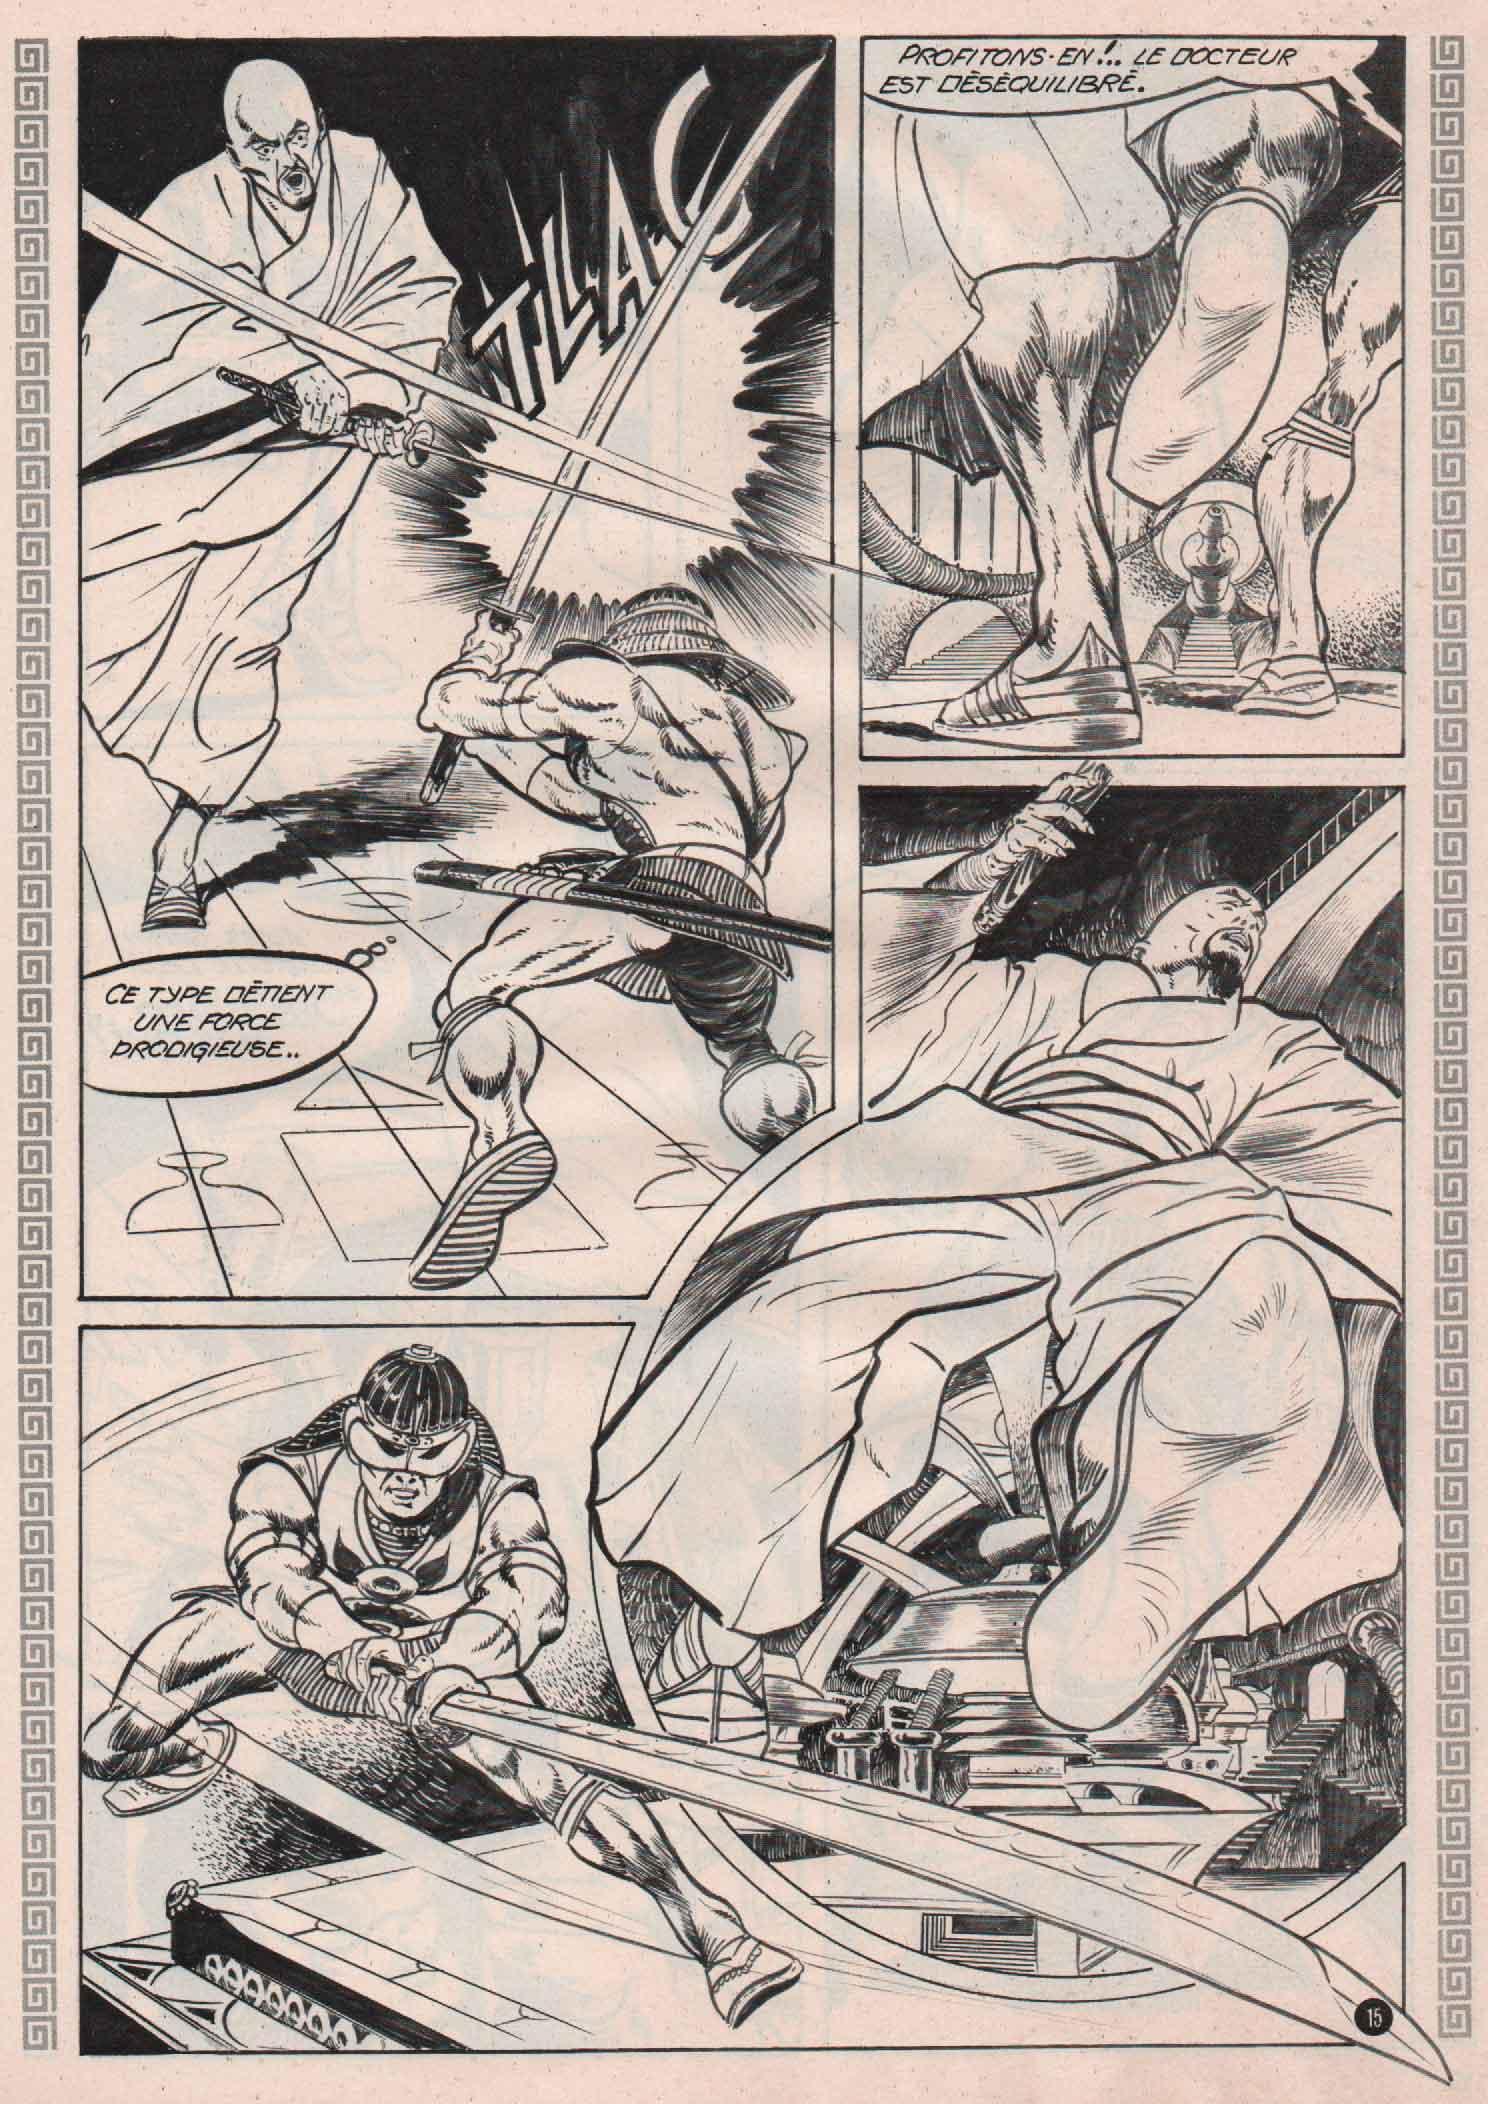 « Sabre le super samouraï » Karaté n° 37 (03/1977).